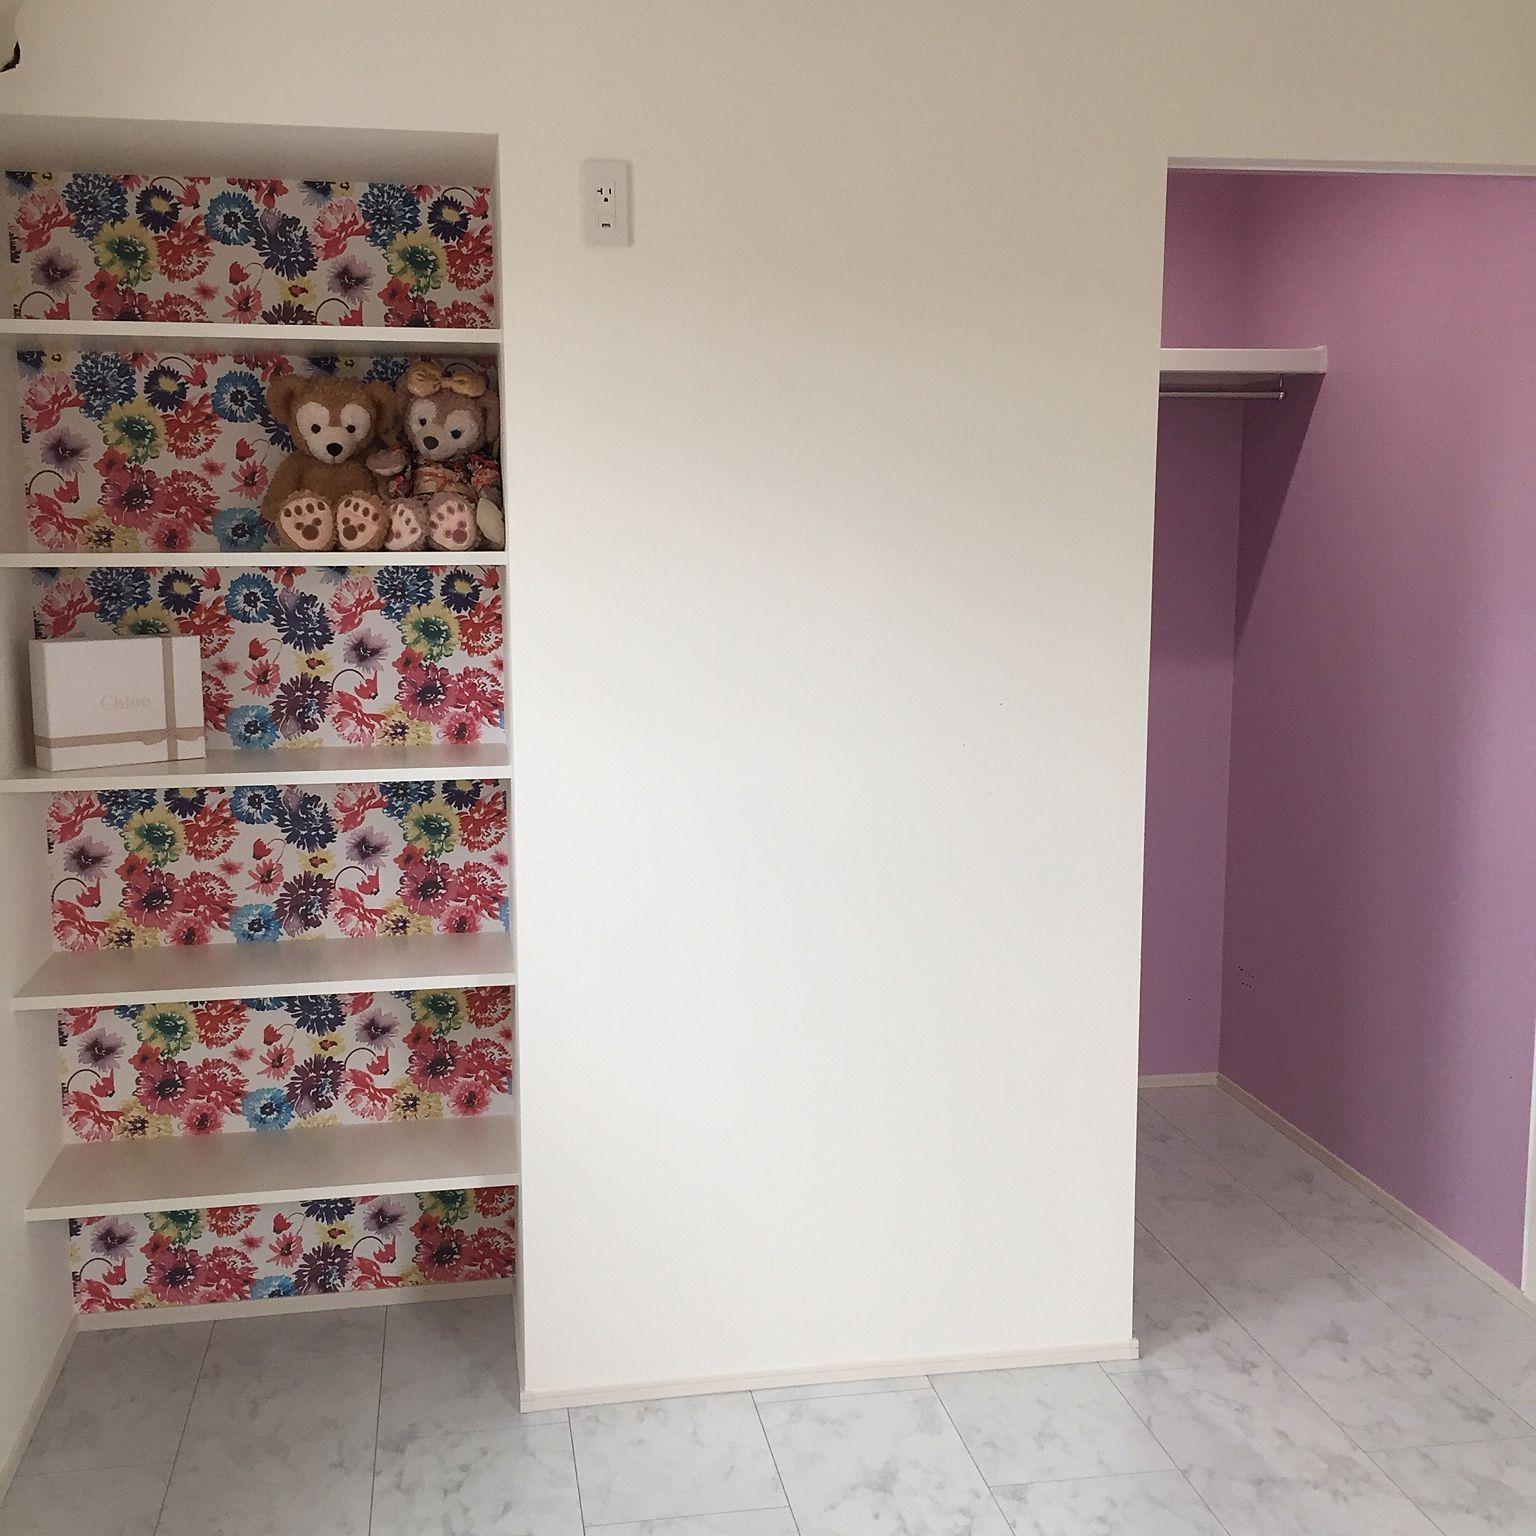 9bce6744530 棚/ウォークインクローゼット/ラベンダーの壁/柄の壁紙/白い床 ...